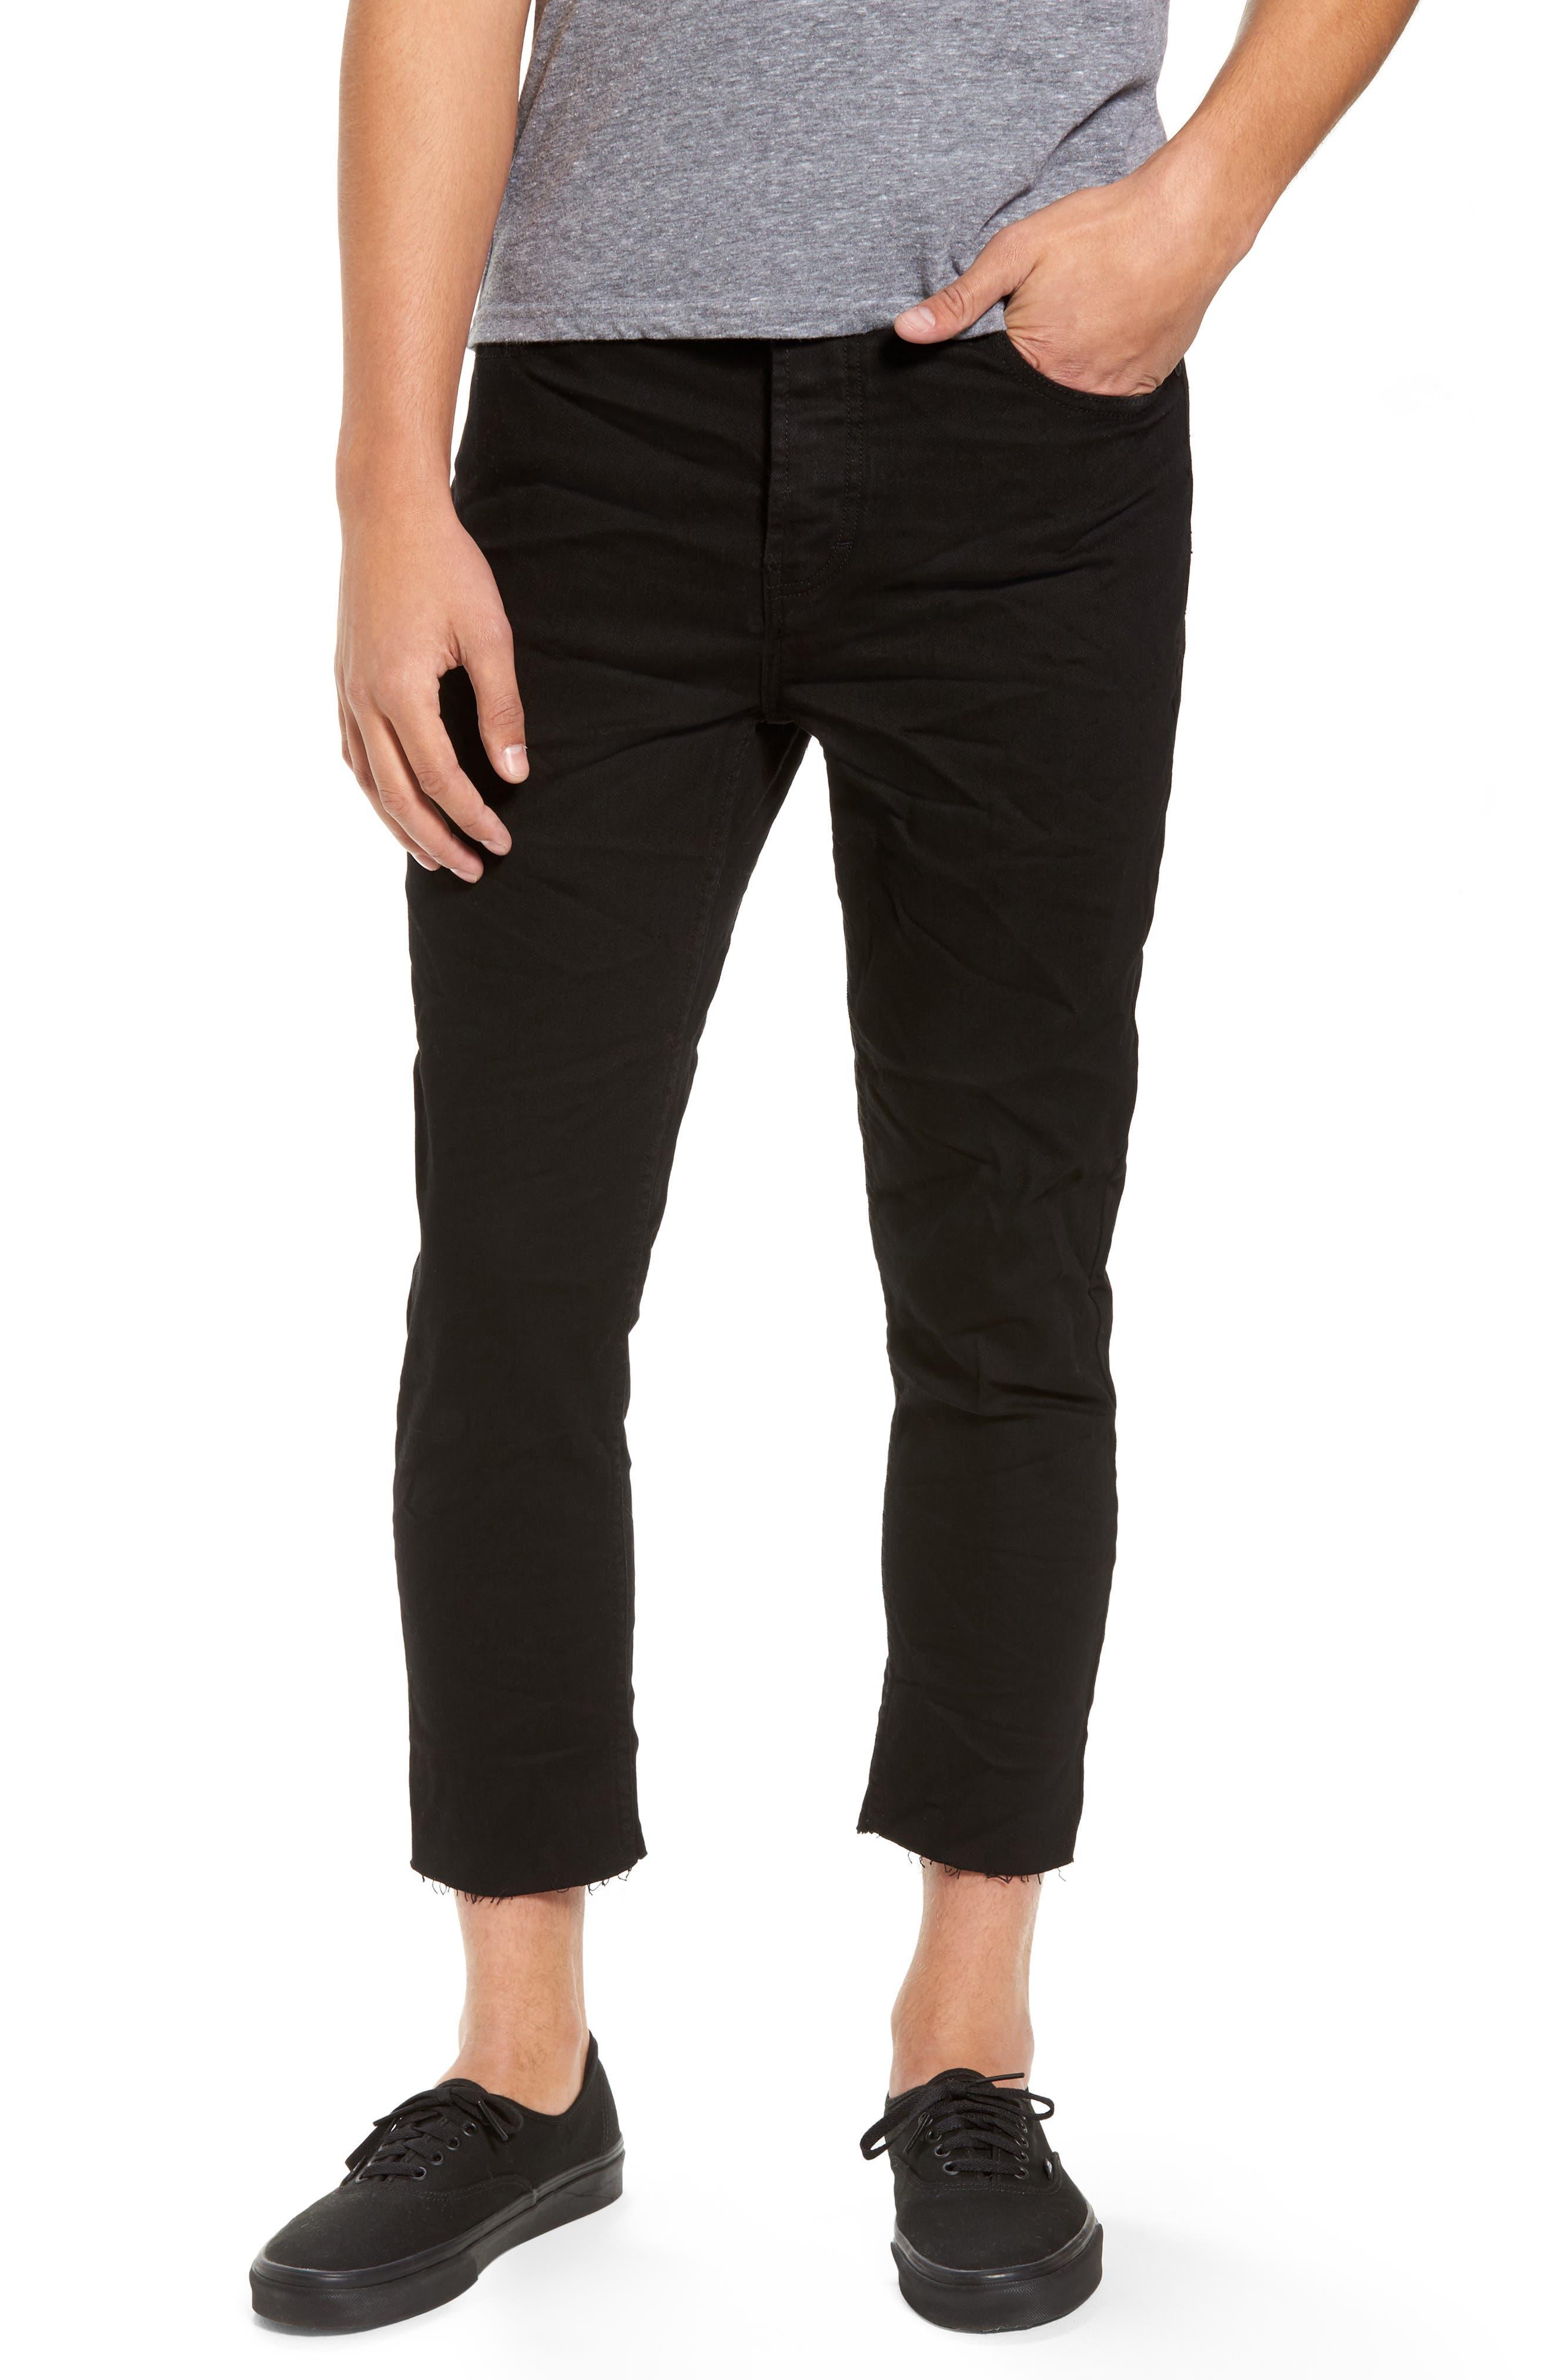 B.Line Crop Slim Fit Jeans,                             Main thumbnail 1, color,                             Washed Black